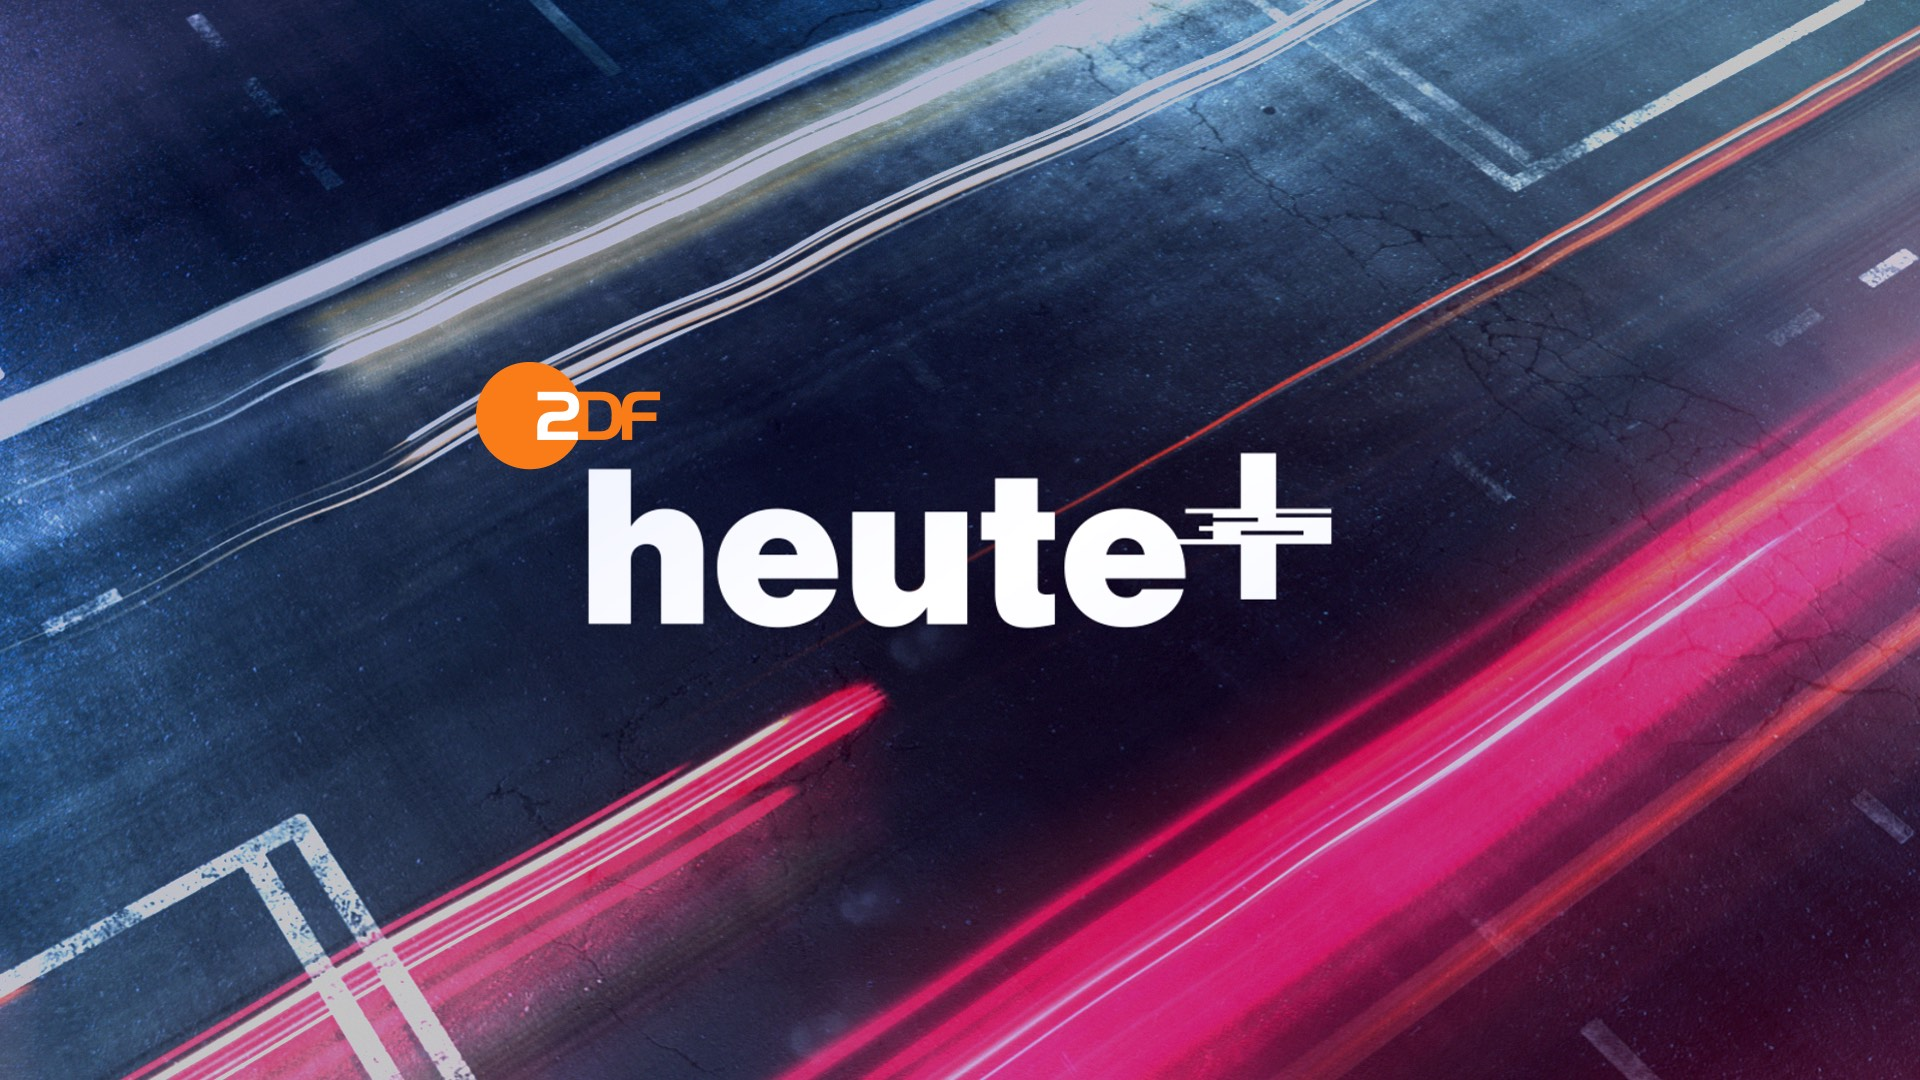 ZDF heute+